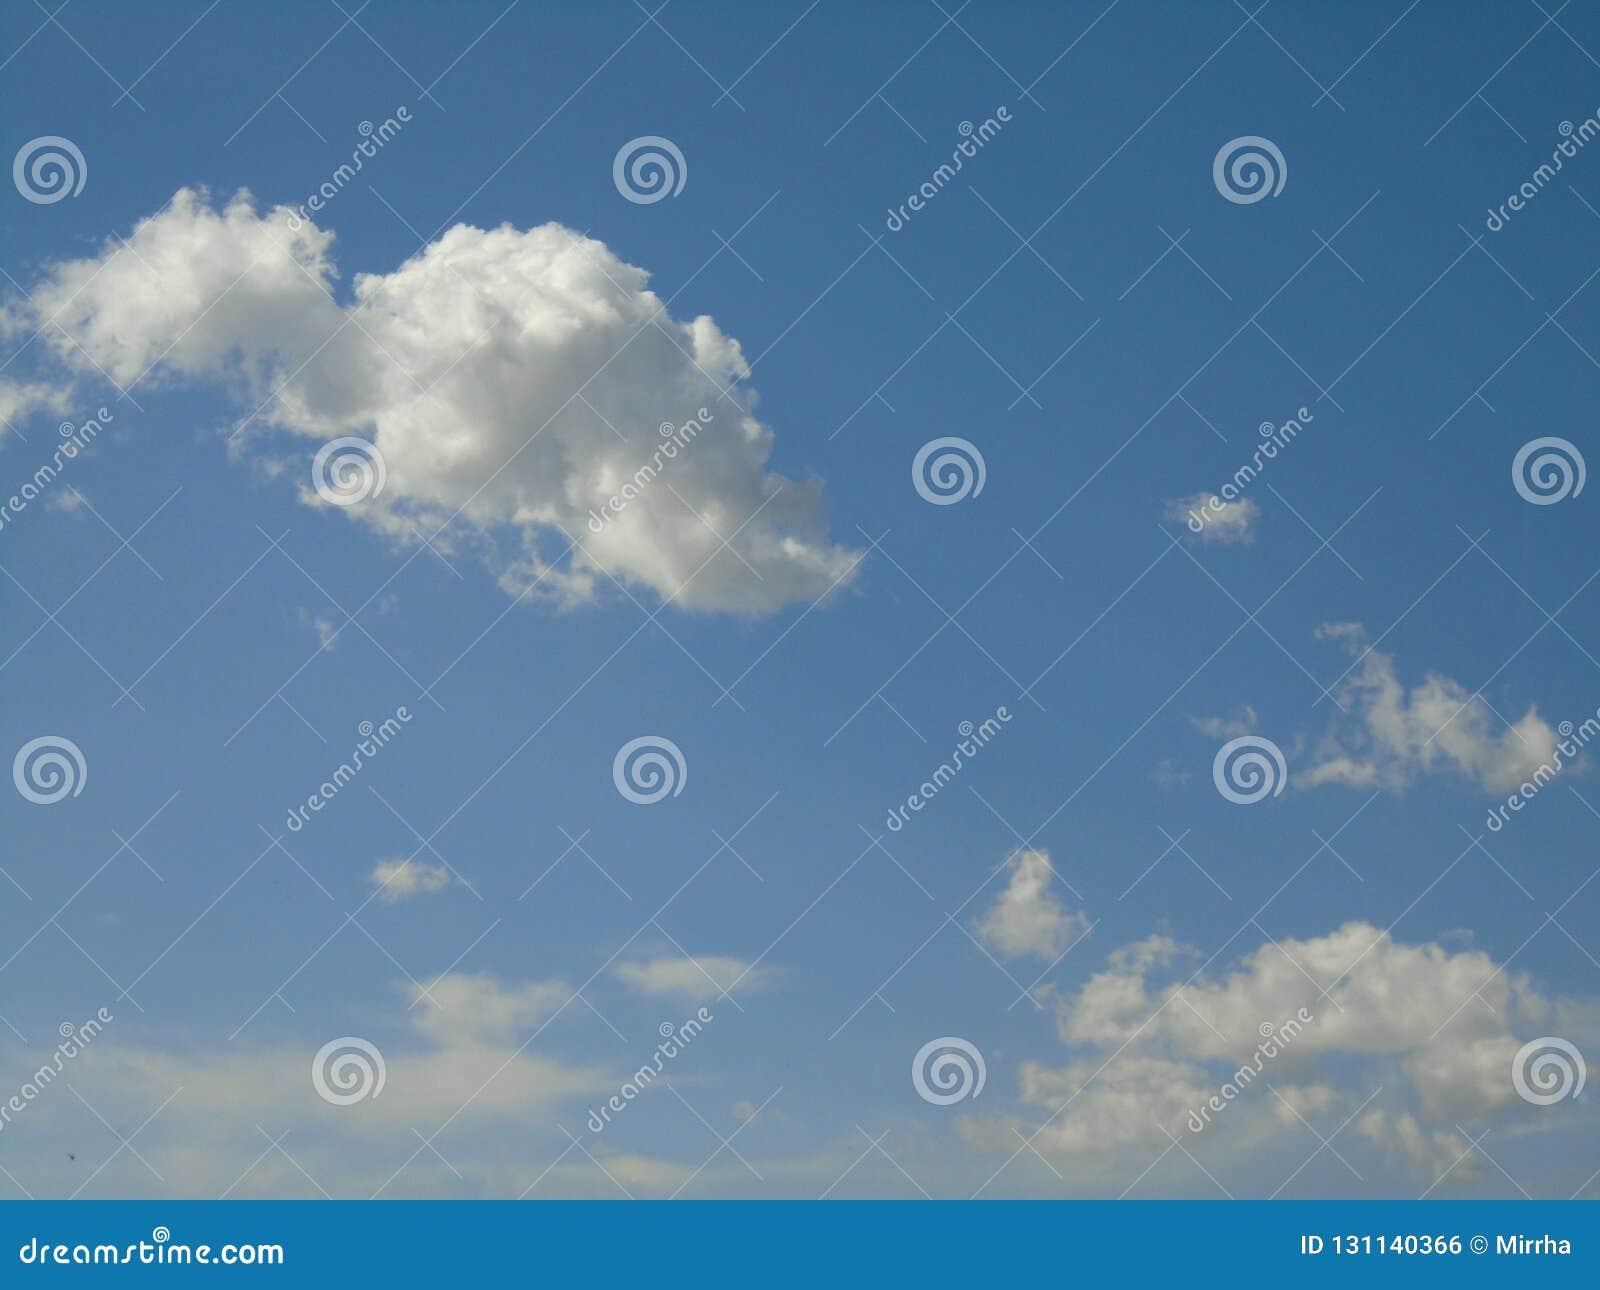 The sky is the king of awsomeness. A cloud looks like a small dinosaur.